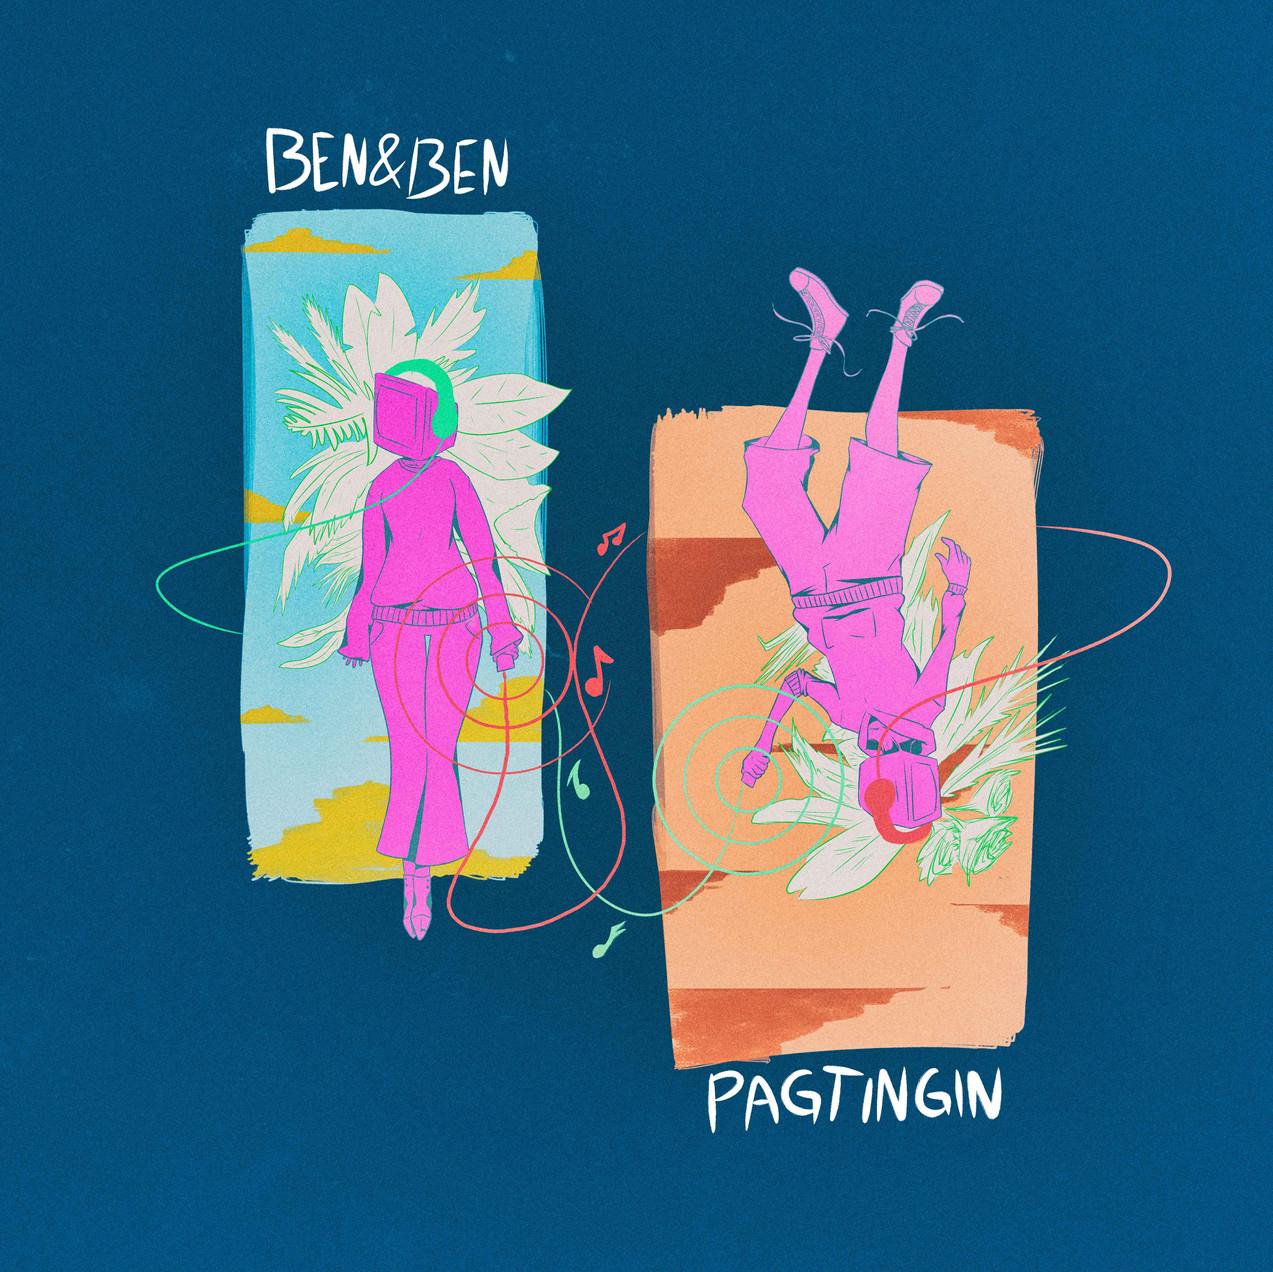 'Pagtingin' - Song art for Ben&Ben's new singles. Art by Nicolai Maverick